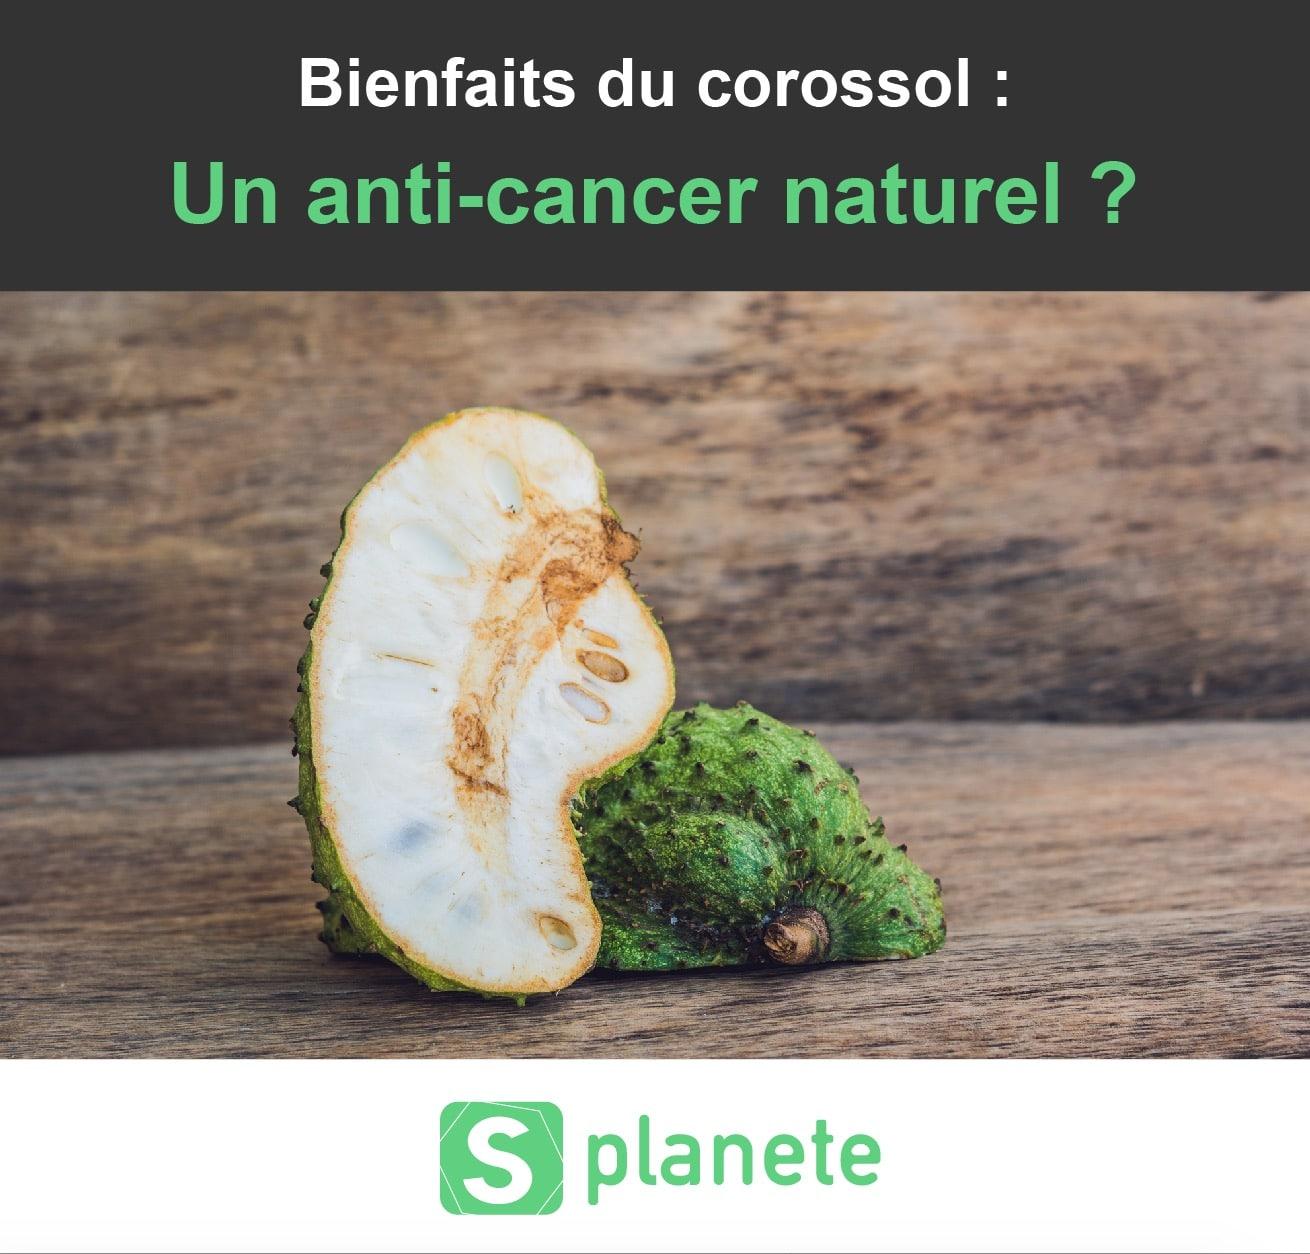 Bienfaits du Corossol : anti-cancer naturel ?